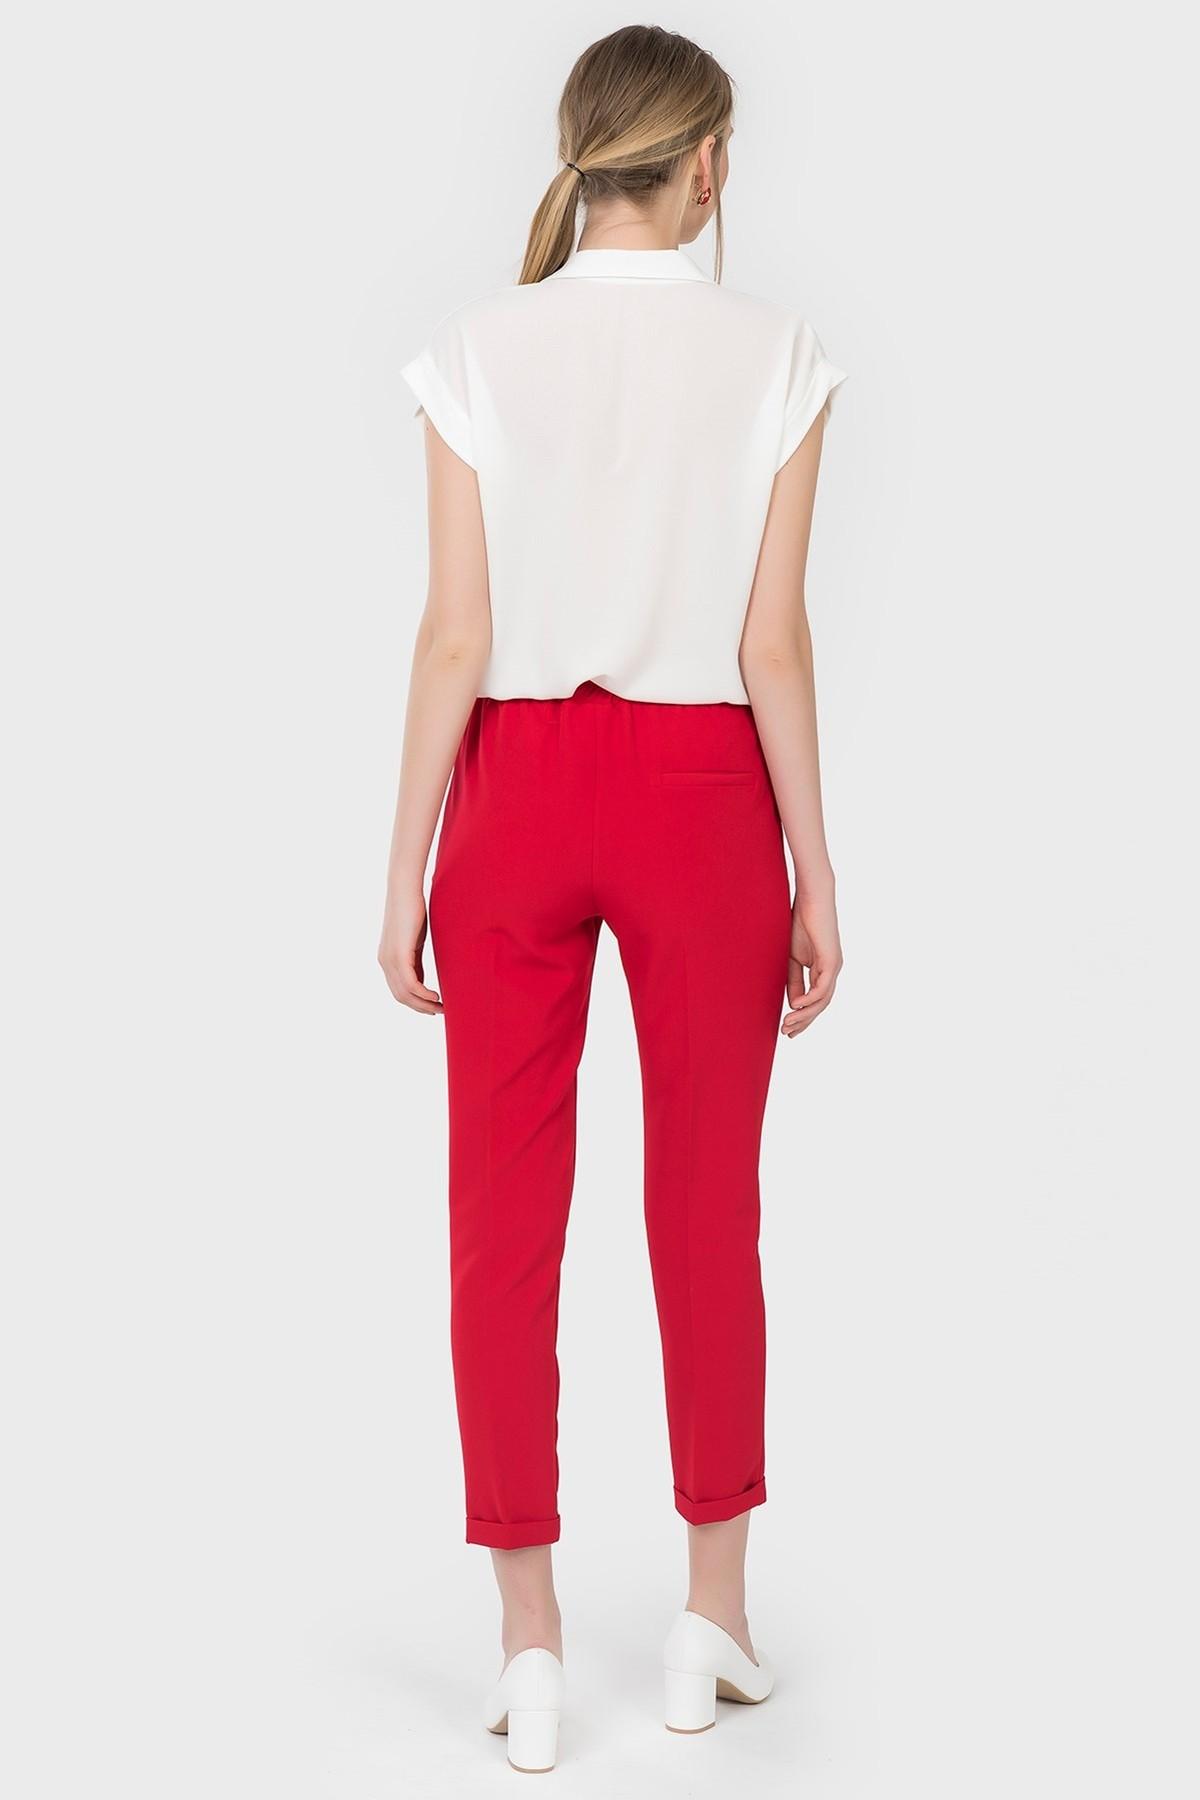 İroni Kadın Kırmızı Jogger Pantolon 1671-891 2